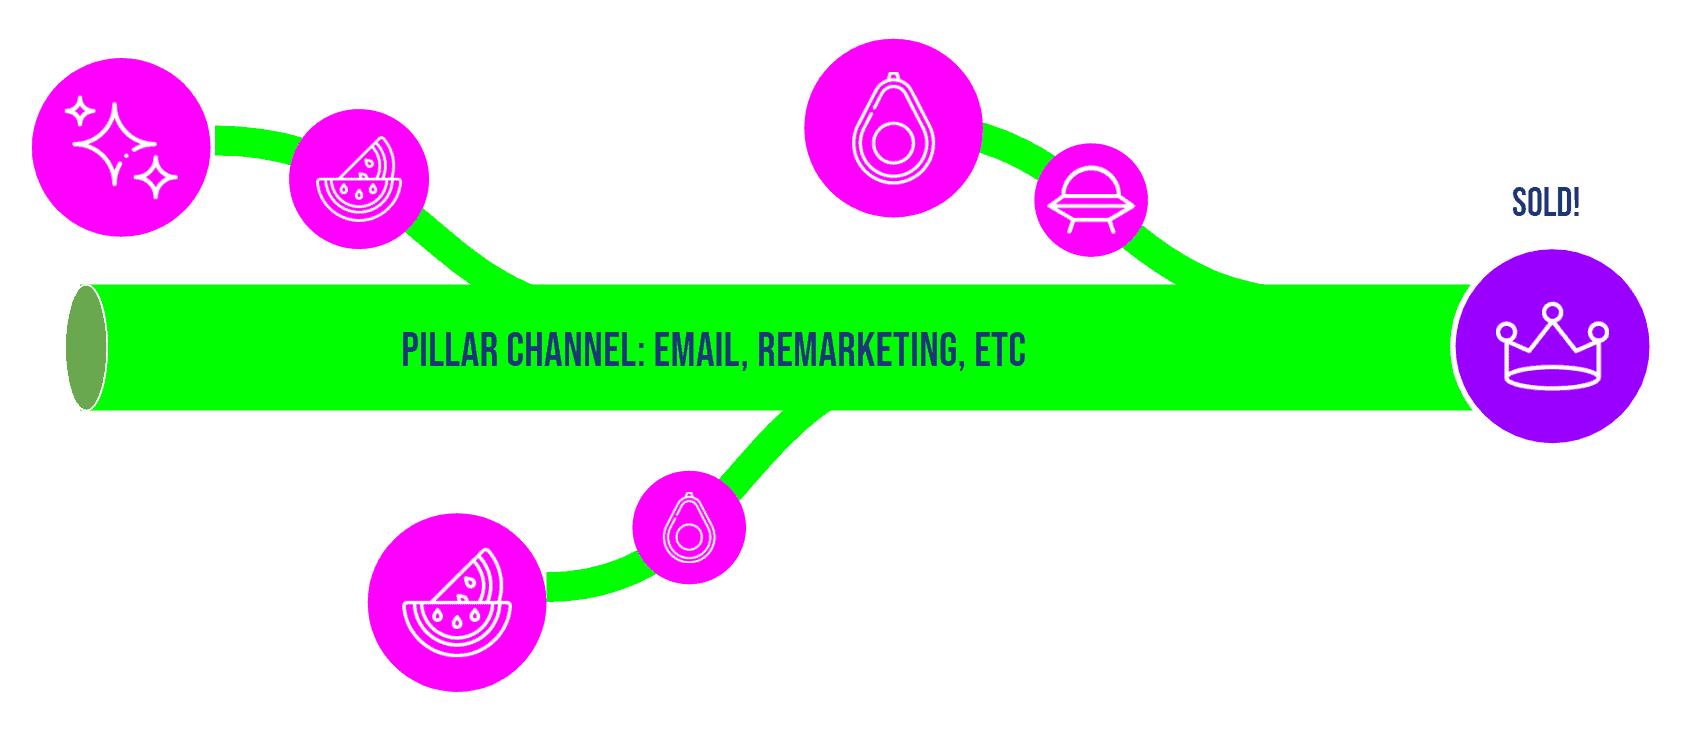 Pillar channel click paths illustration